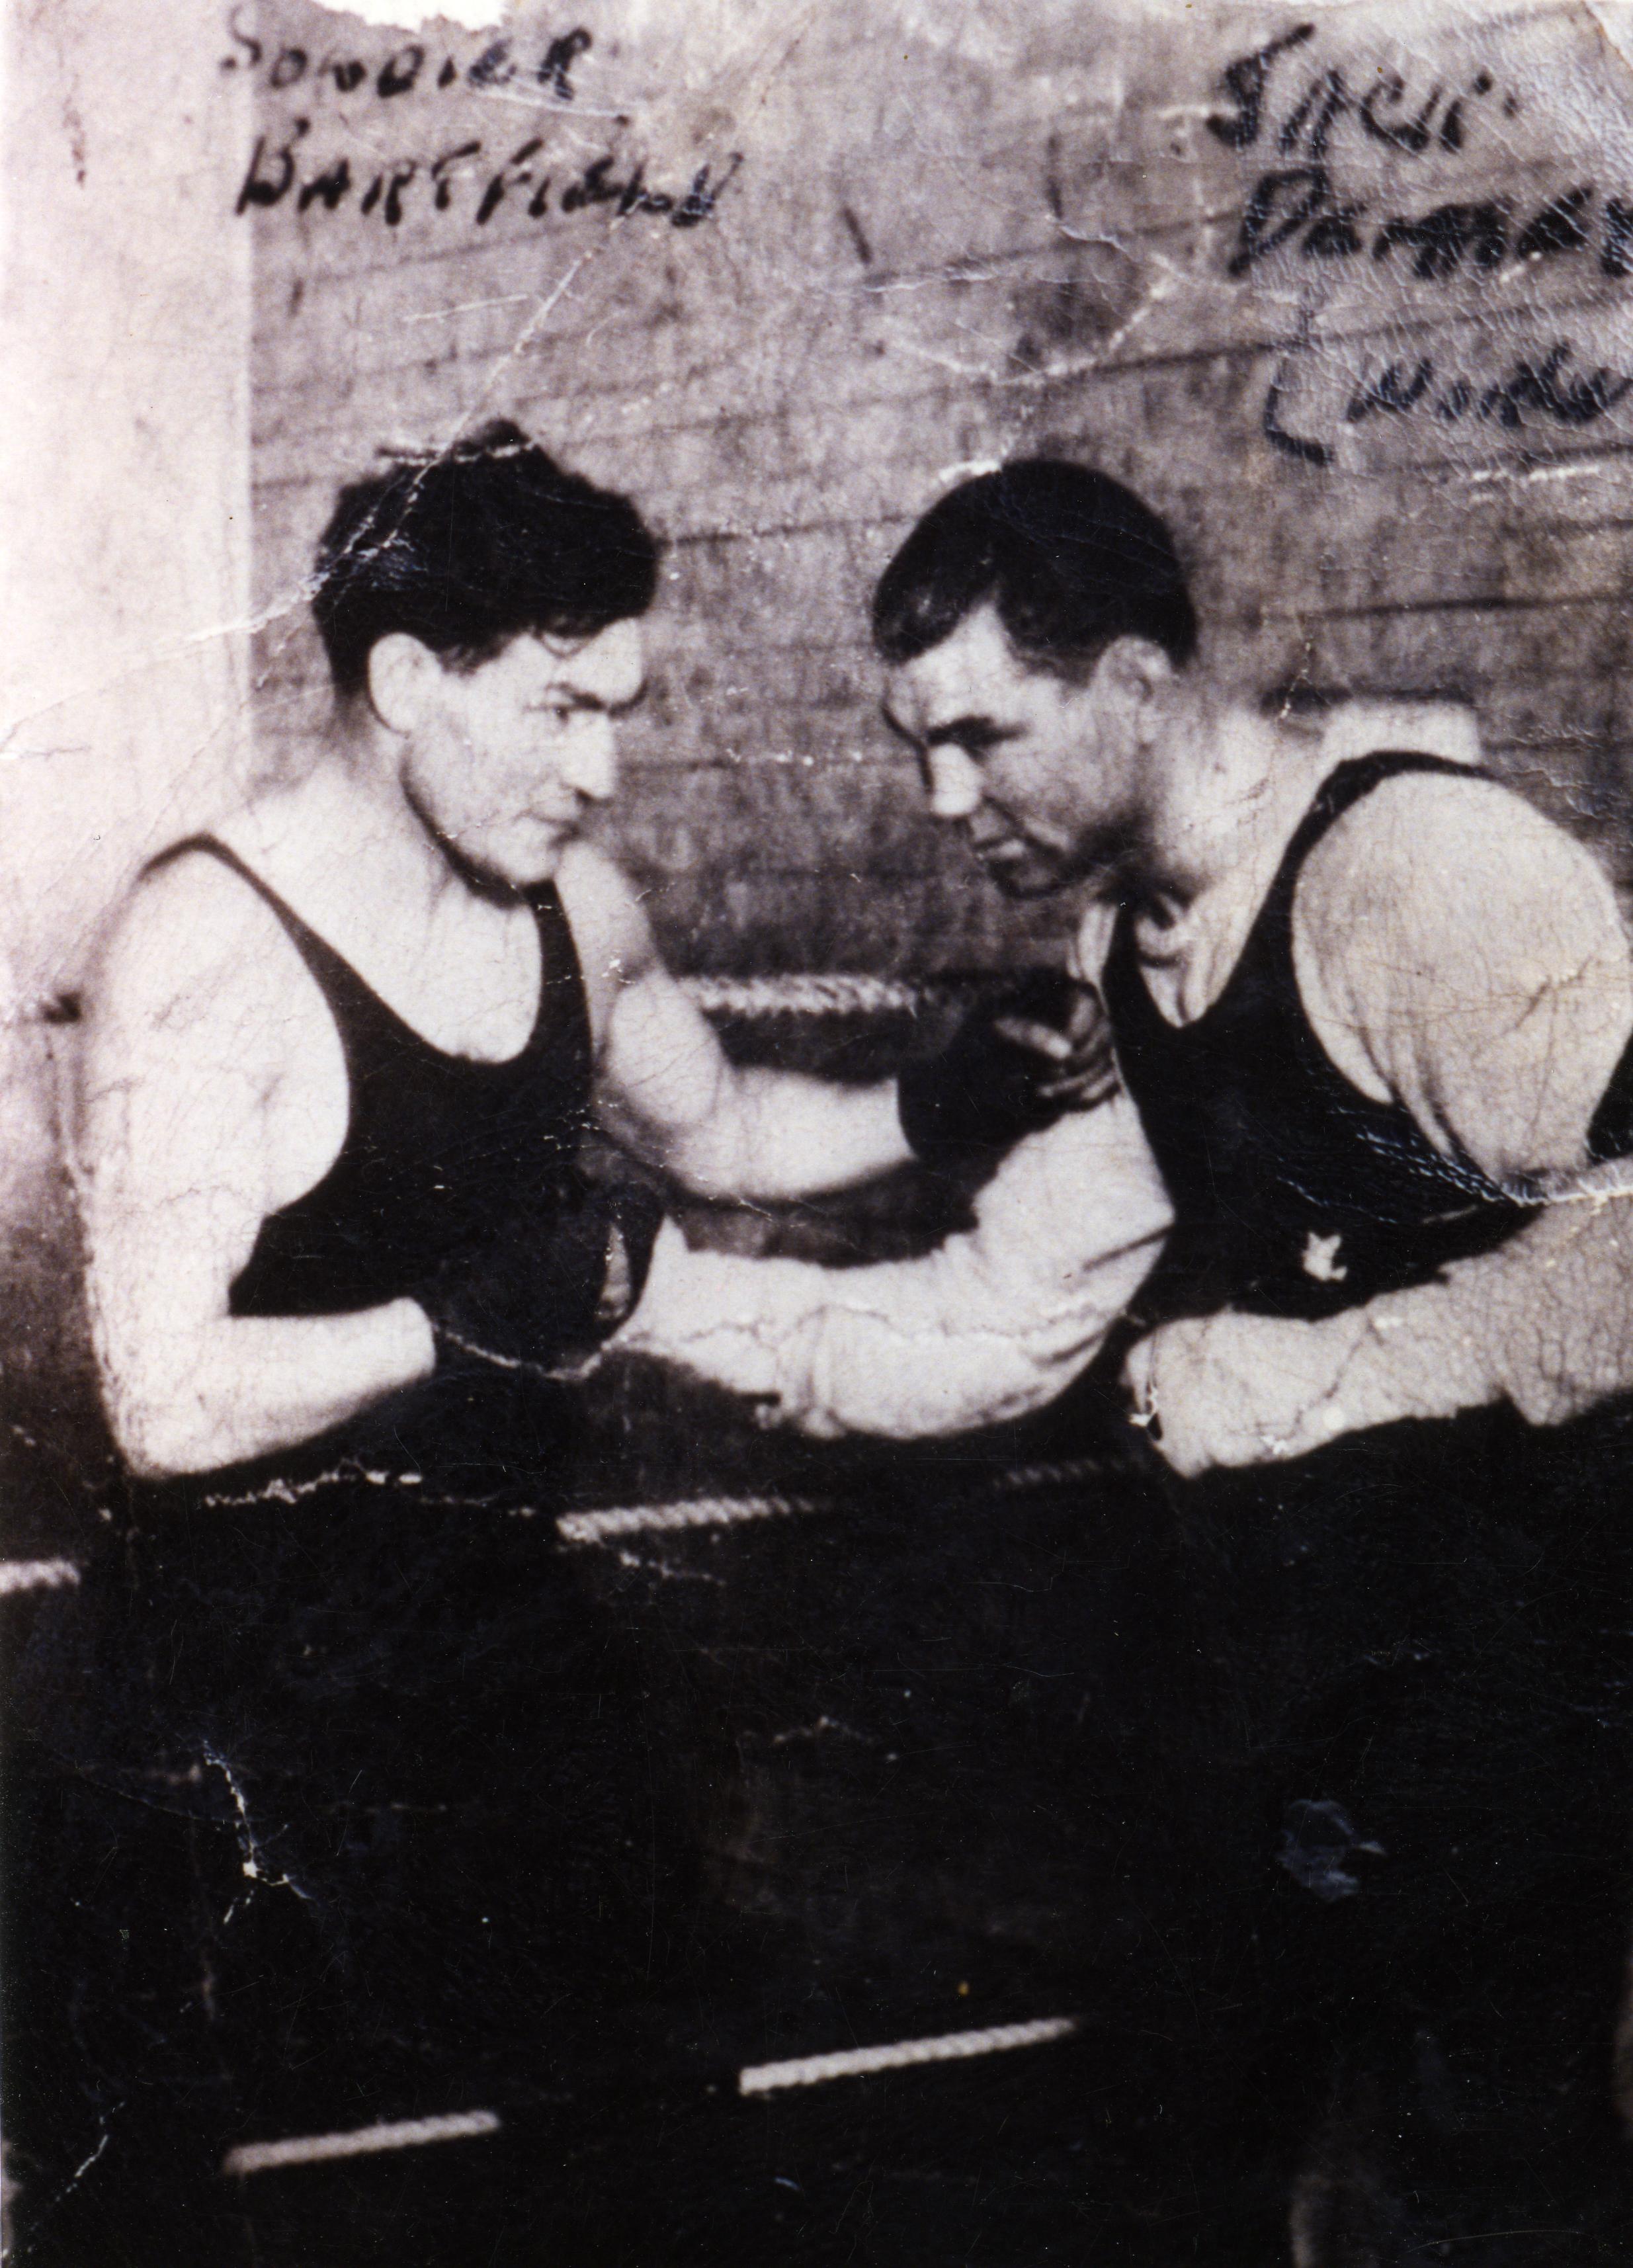 John Pavlovich and Jack Dempsey